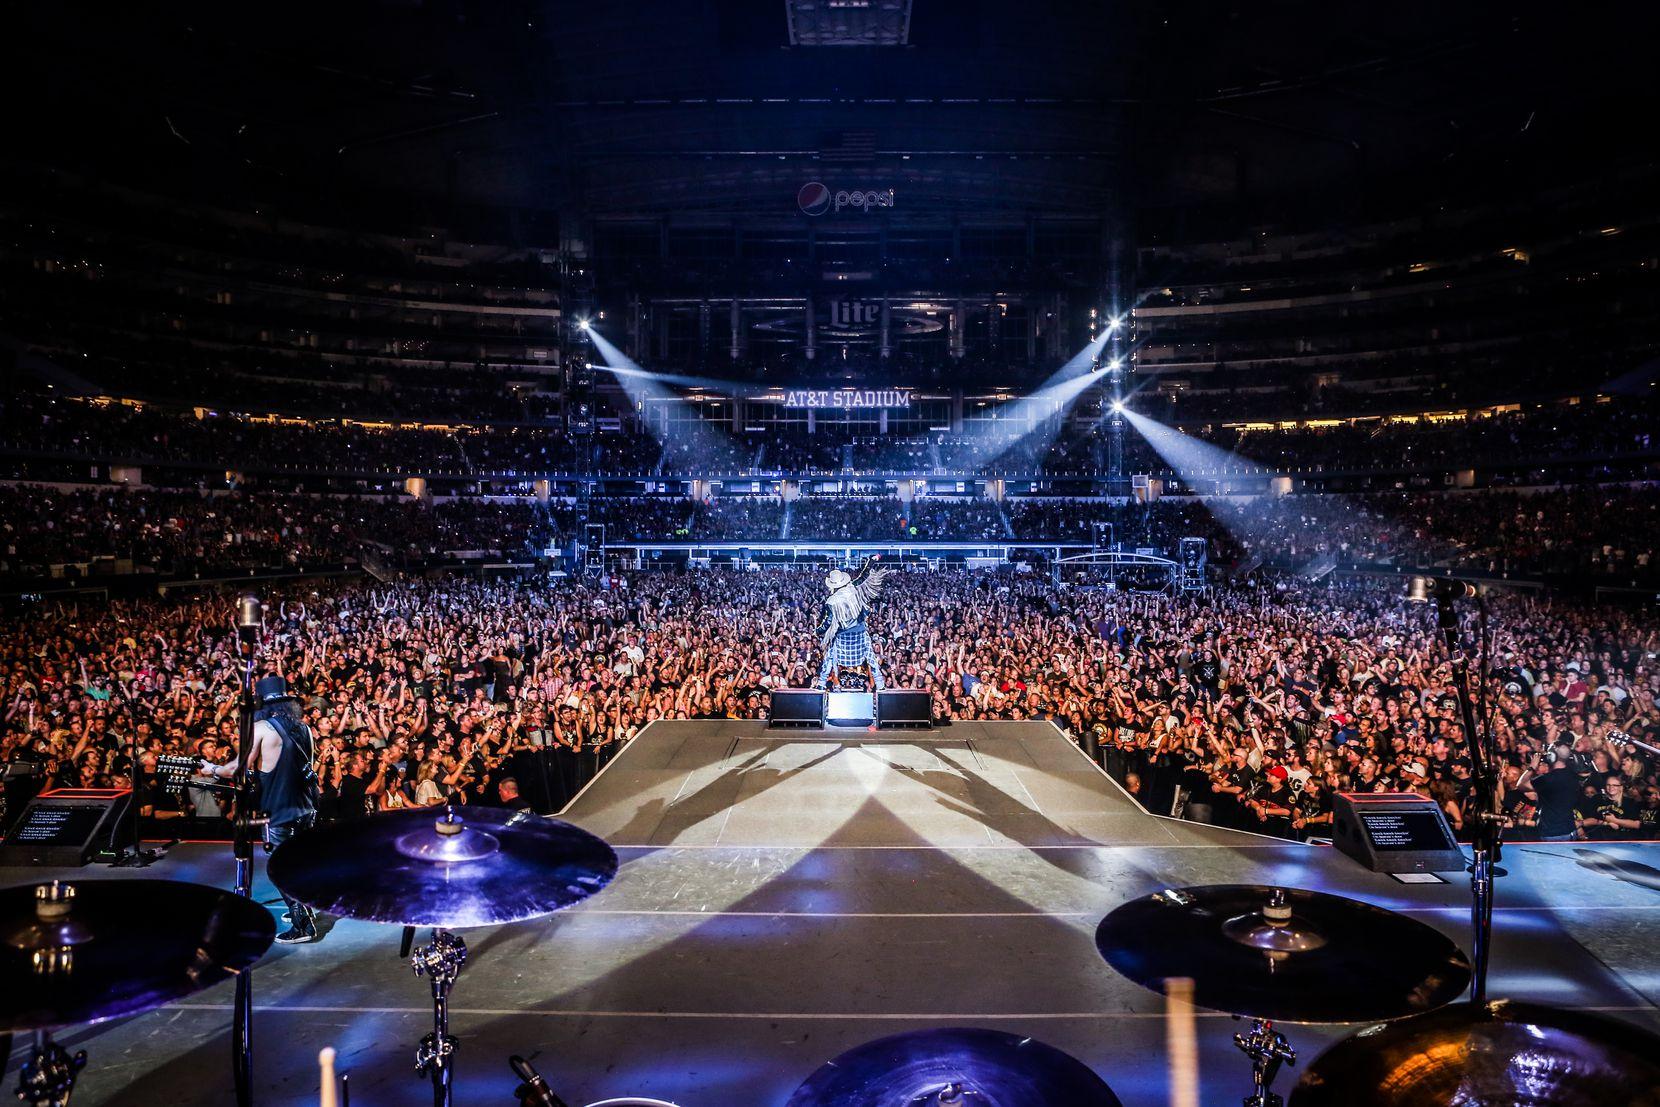 Guns N' Roses performed at AT&T Stadium in Arlington on Aug. 3, 2016.